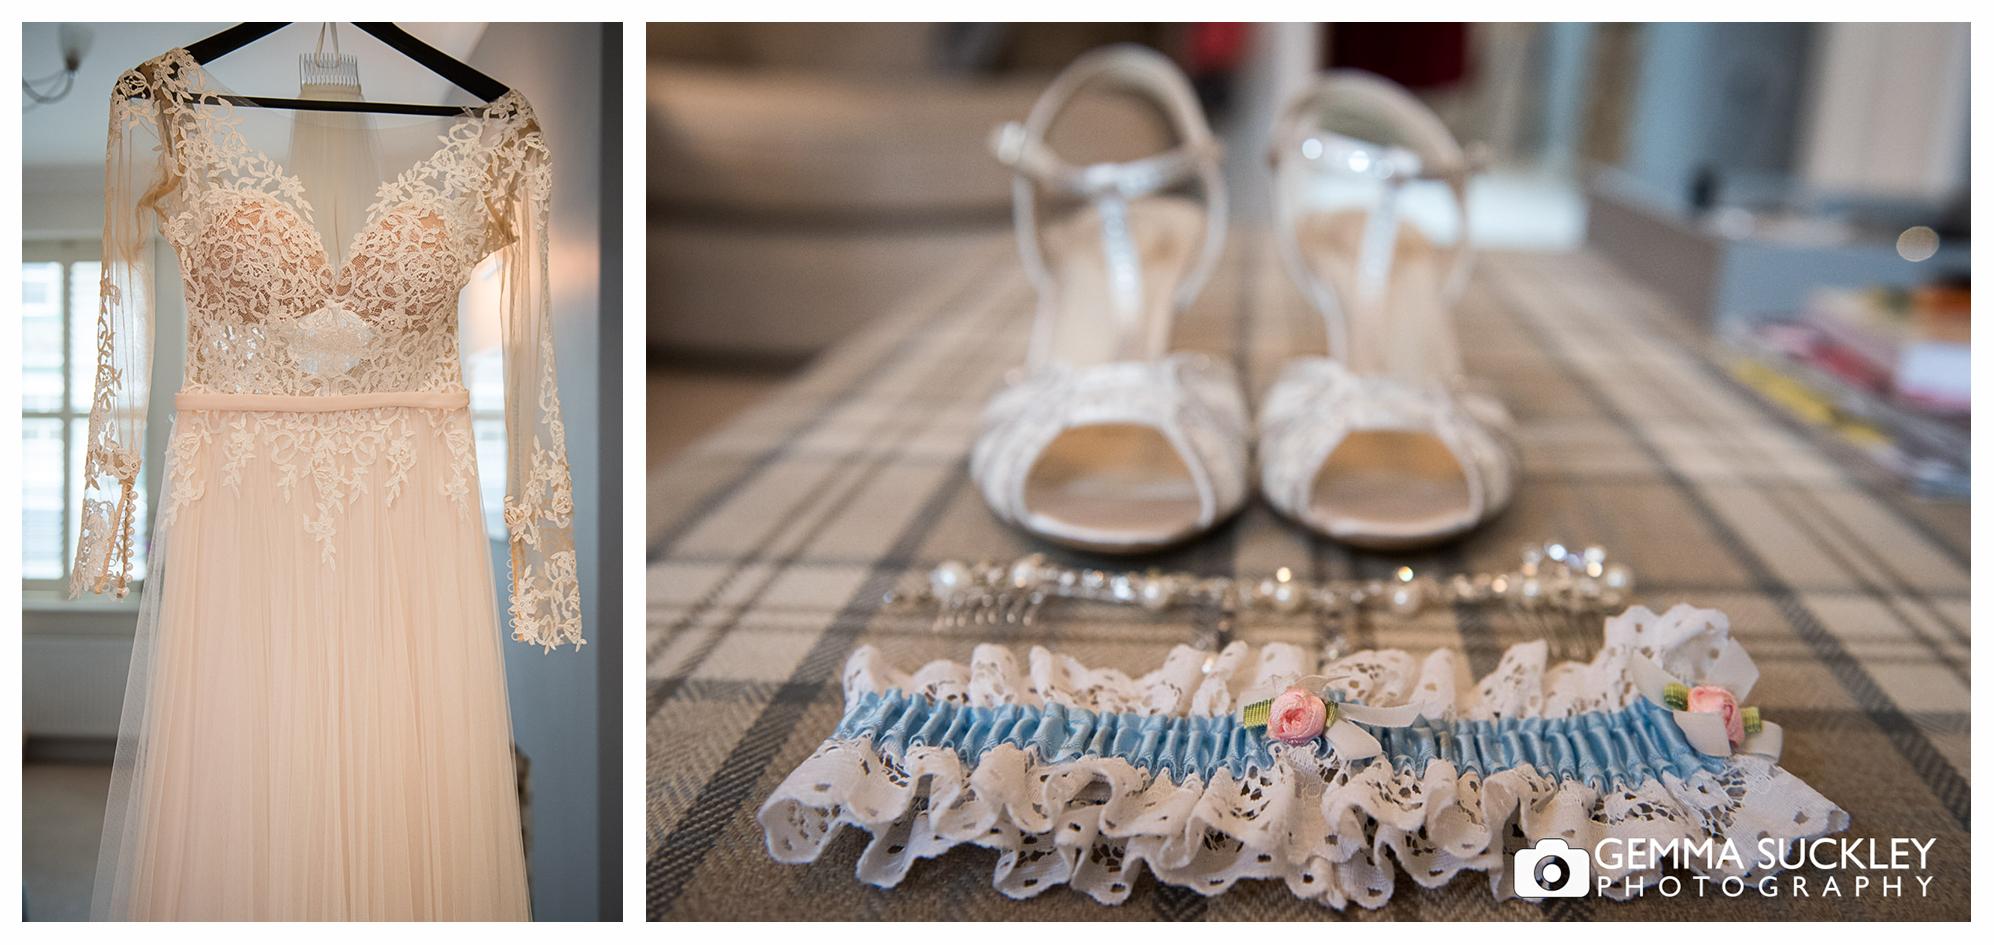 ava rose wedding dress